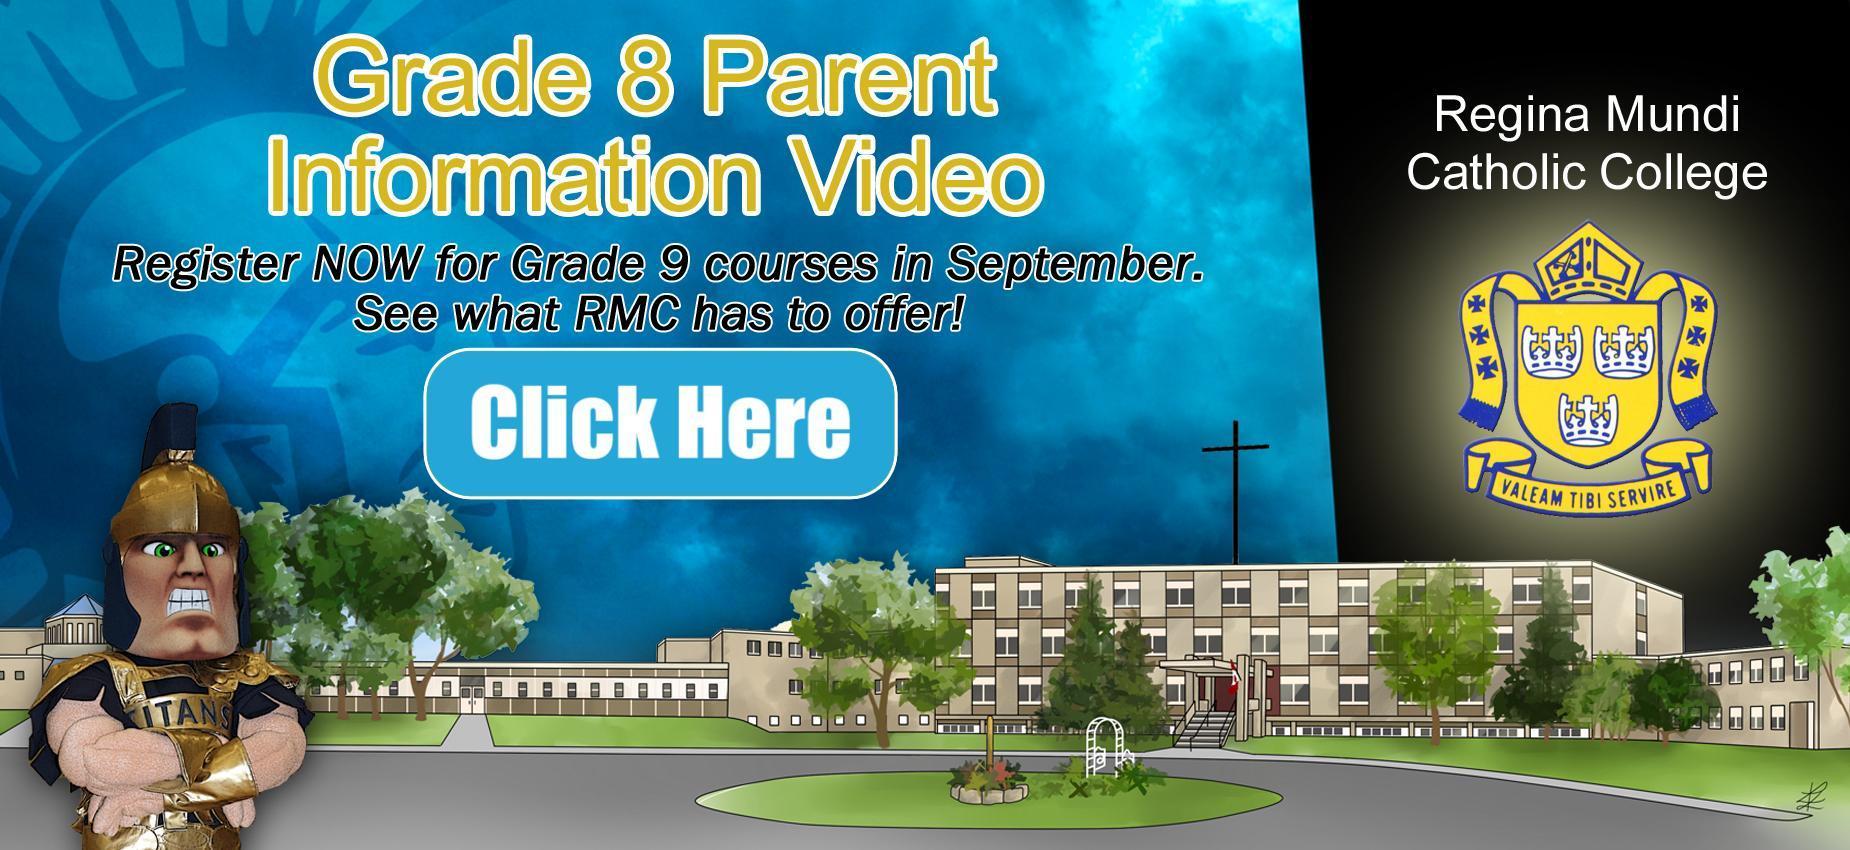 Grade 8 Parent Information Video